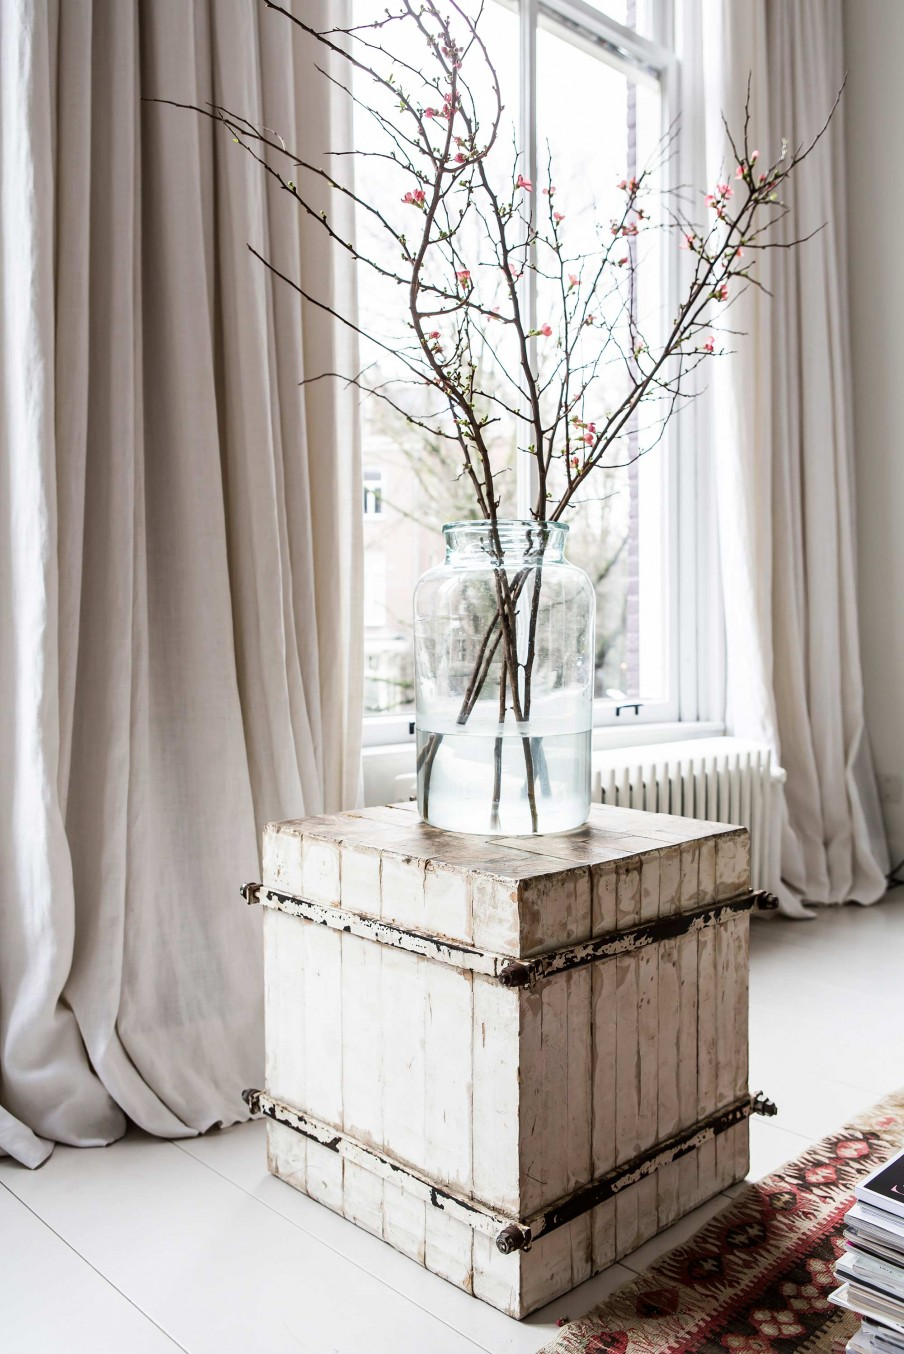 cerisier-fleur-salon-maison-deco-amsterdam-lili-in-wonderland